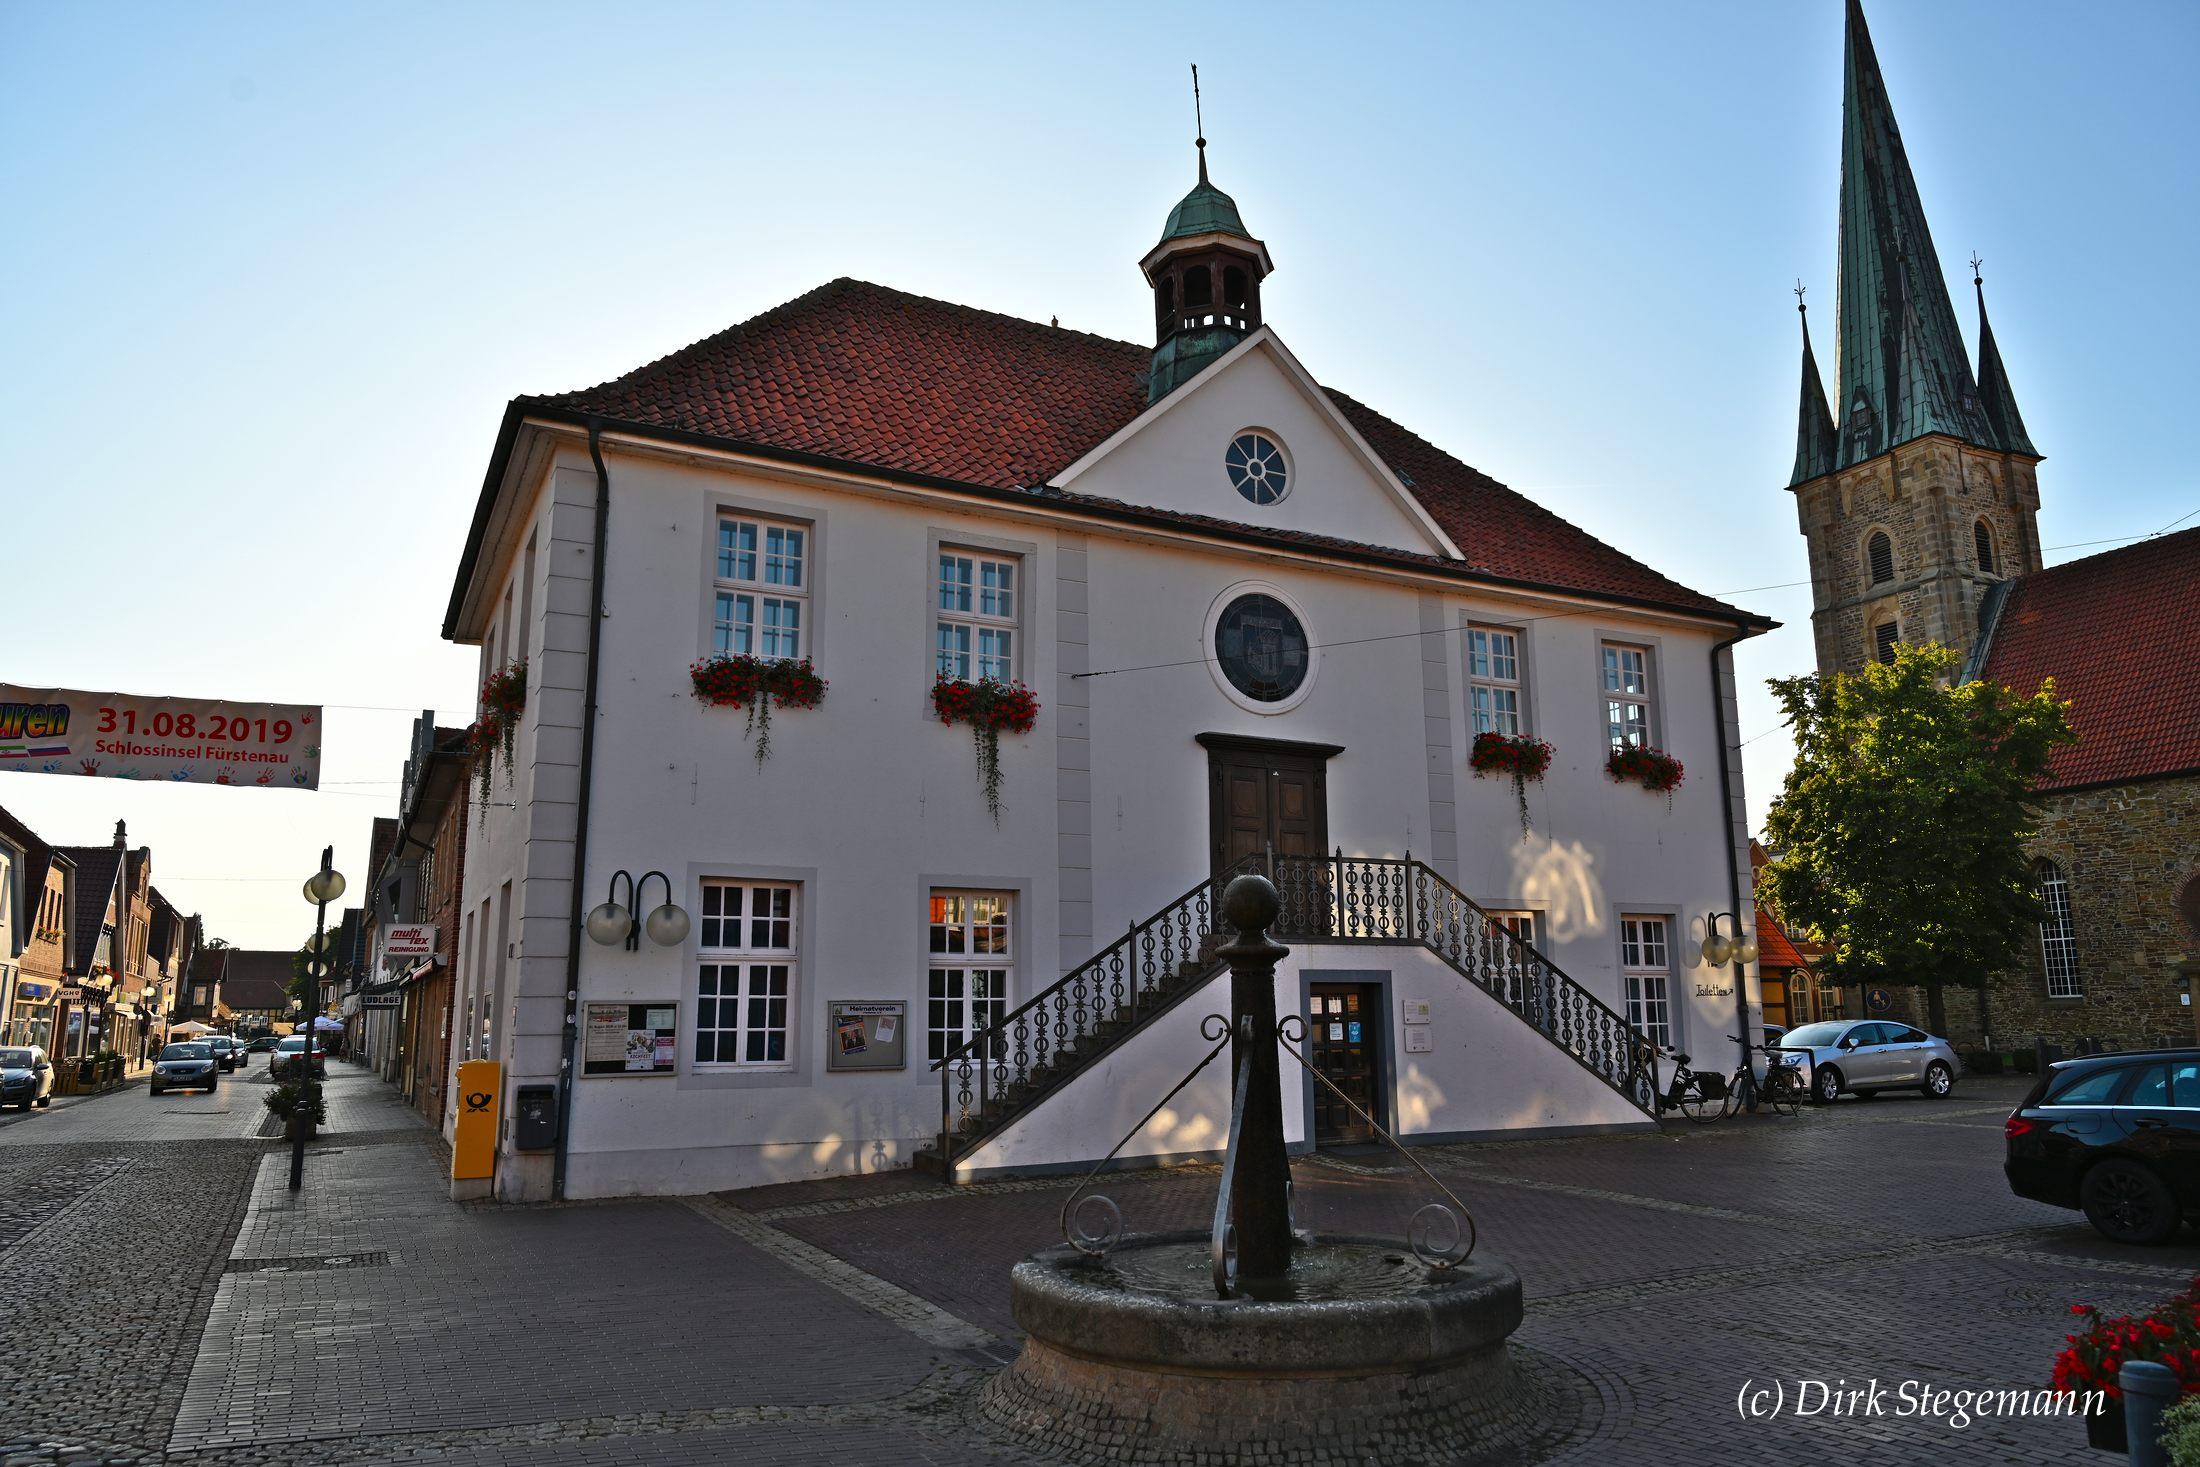 Fürstenau